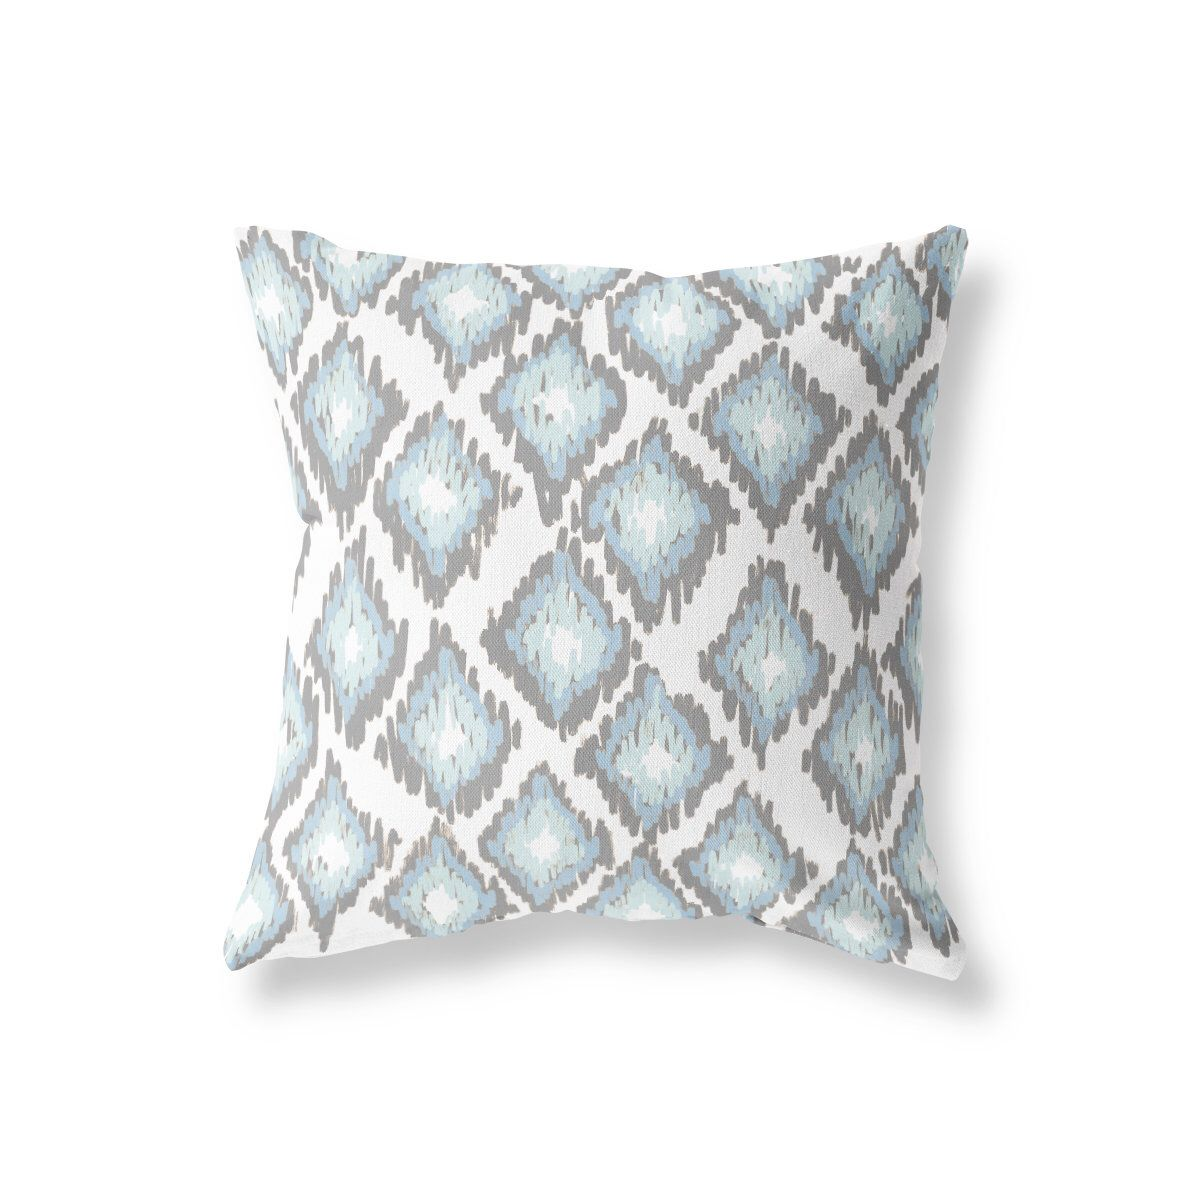 Blue Gray Ikat Throw Pillow Geometric Decorative Pillow Housewarming Gift 18x18 16x Pillows Decorative Patterns Unique Decorative Pillows Geometric Pillow